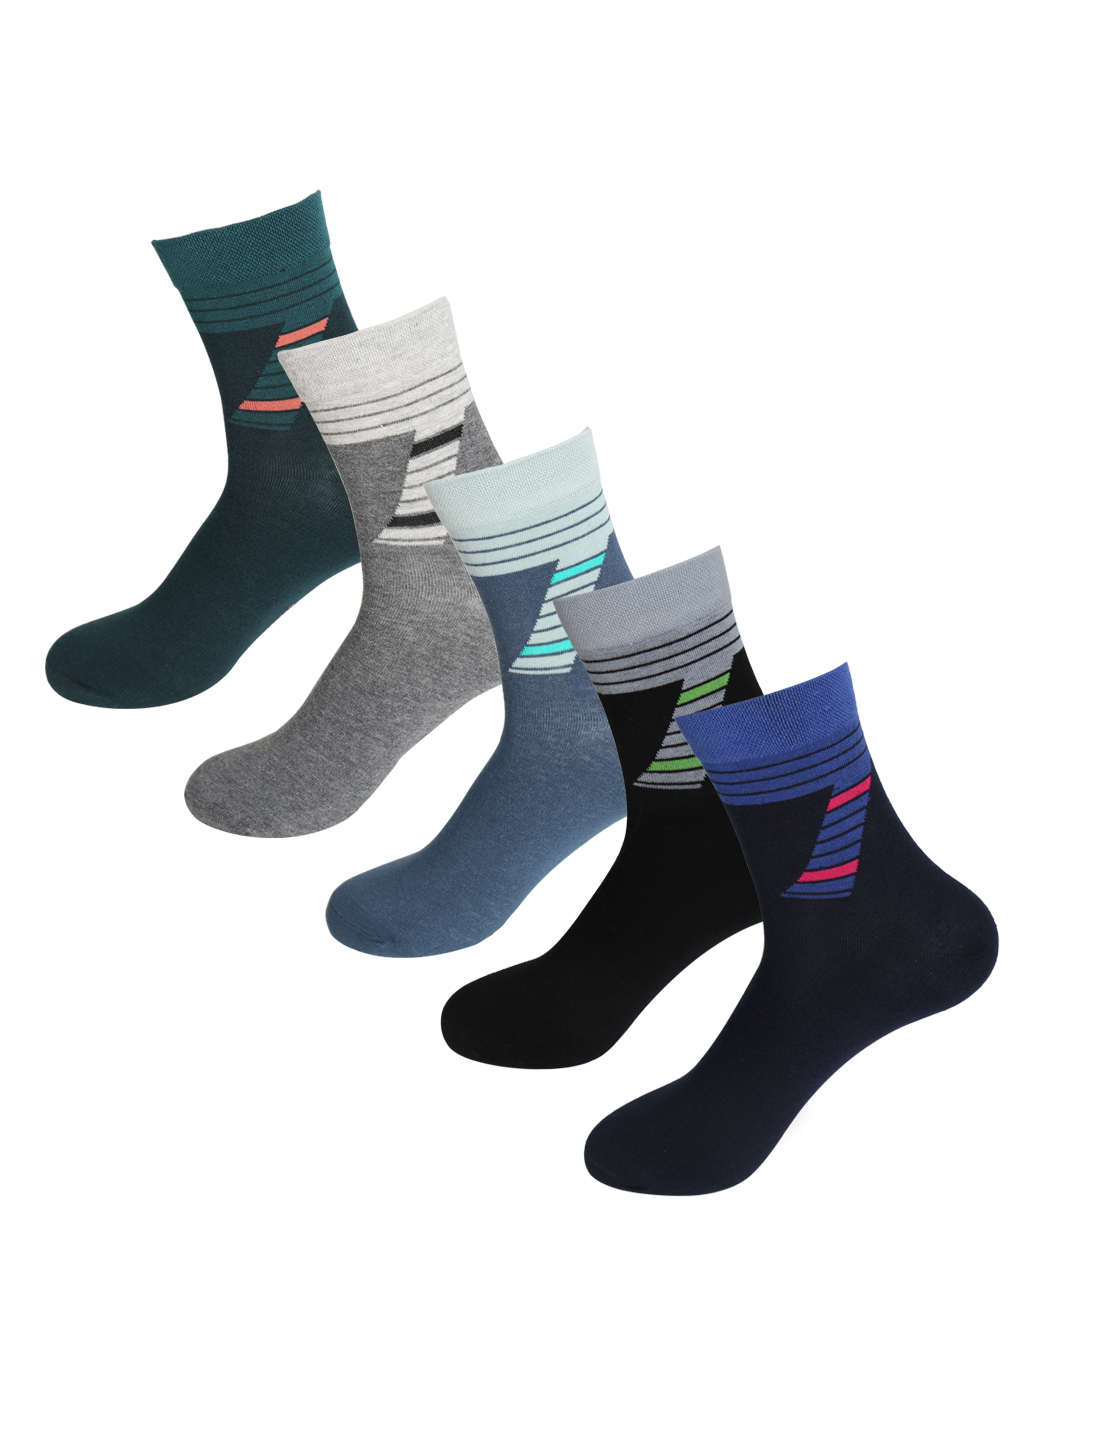 Men 5 Pack Cotton Blend Elastic Bold Stripe Crew Socks Assorted 10-12